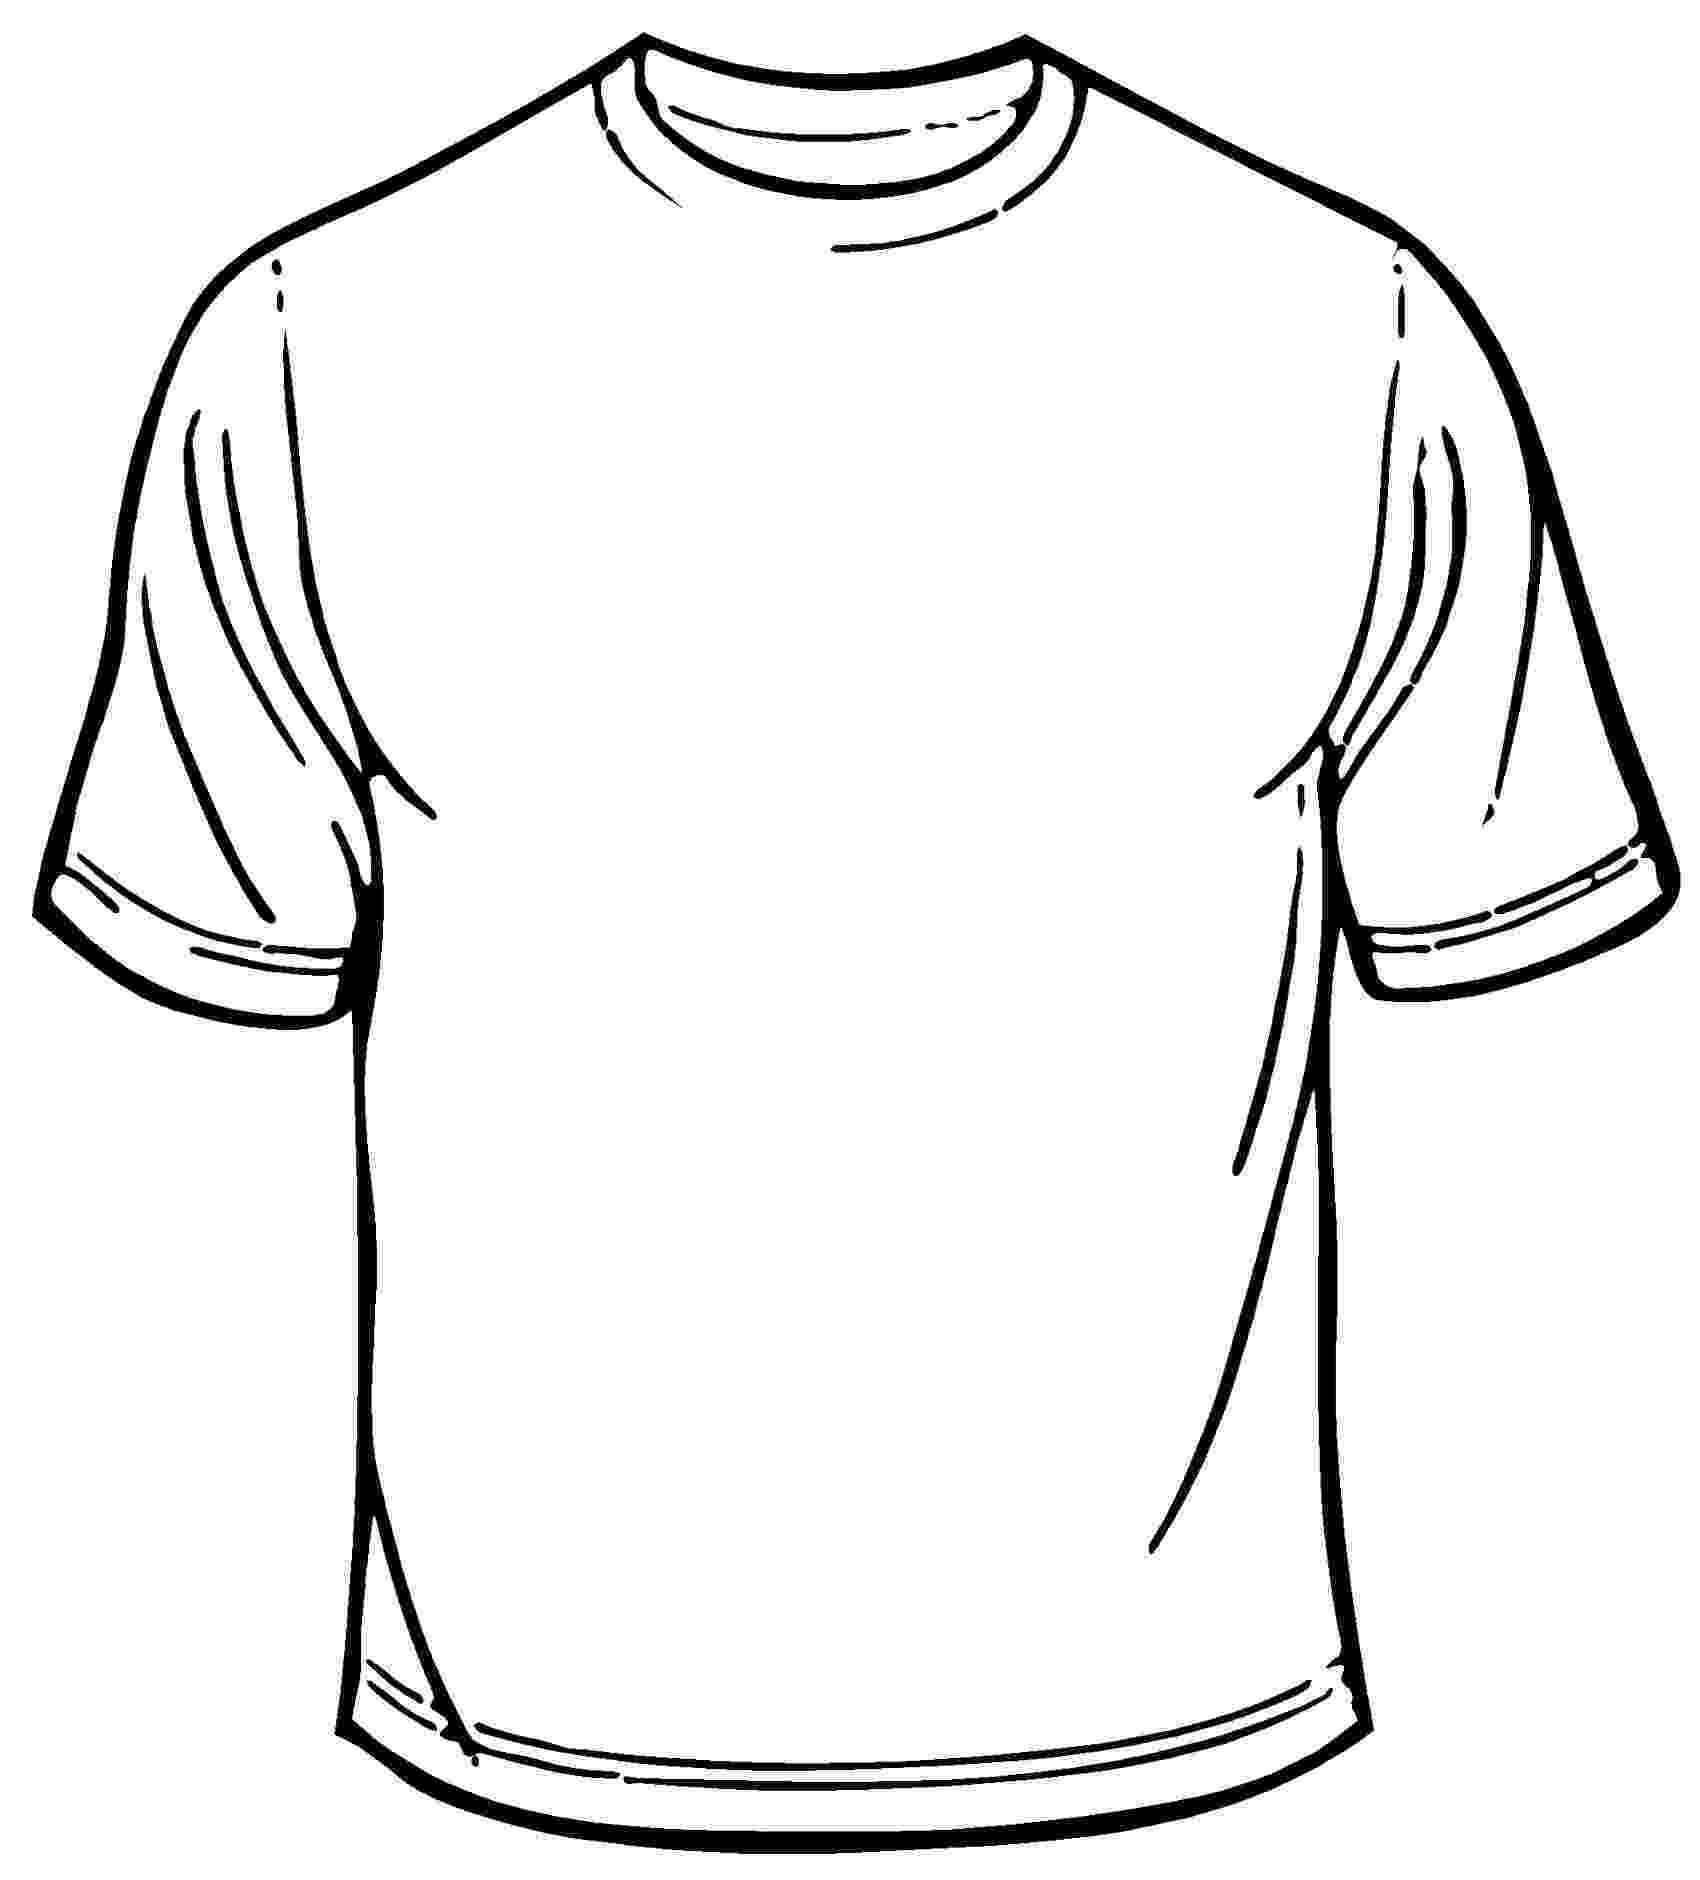 blank tshirt template pdf blank tshirt template e commercewordpress tshirt pdf template blank